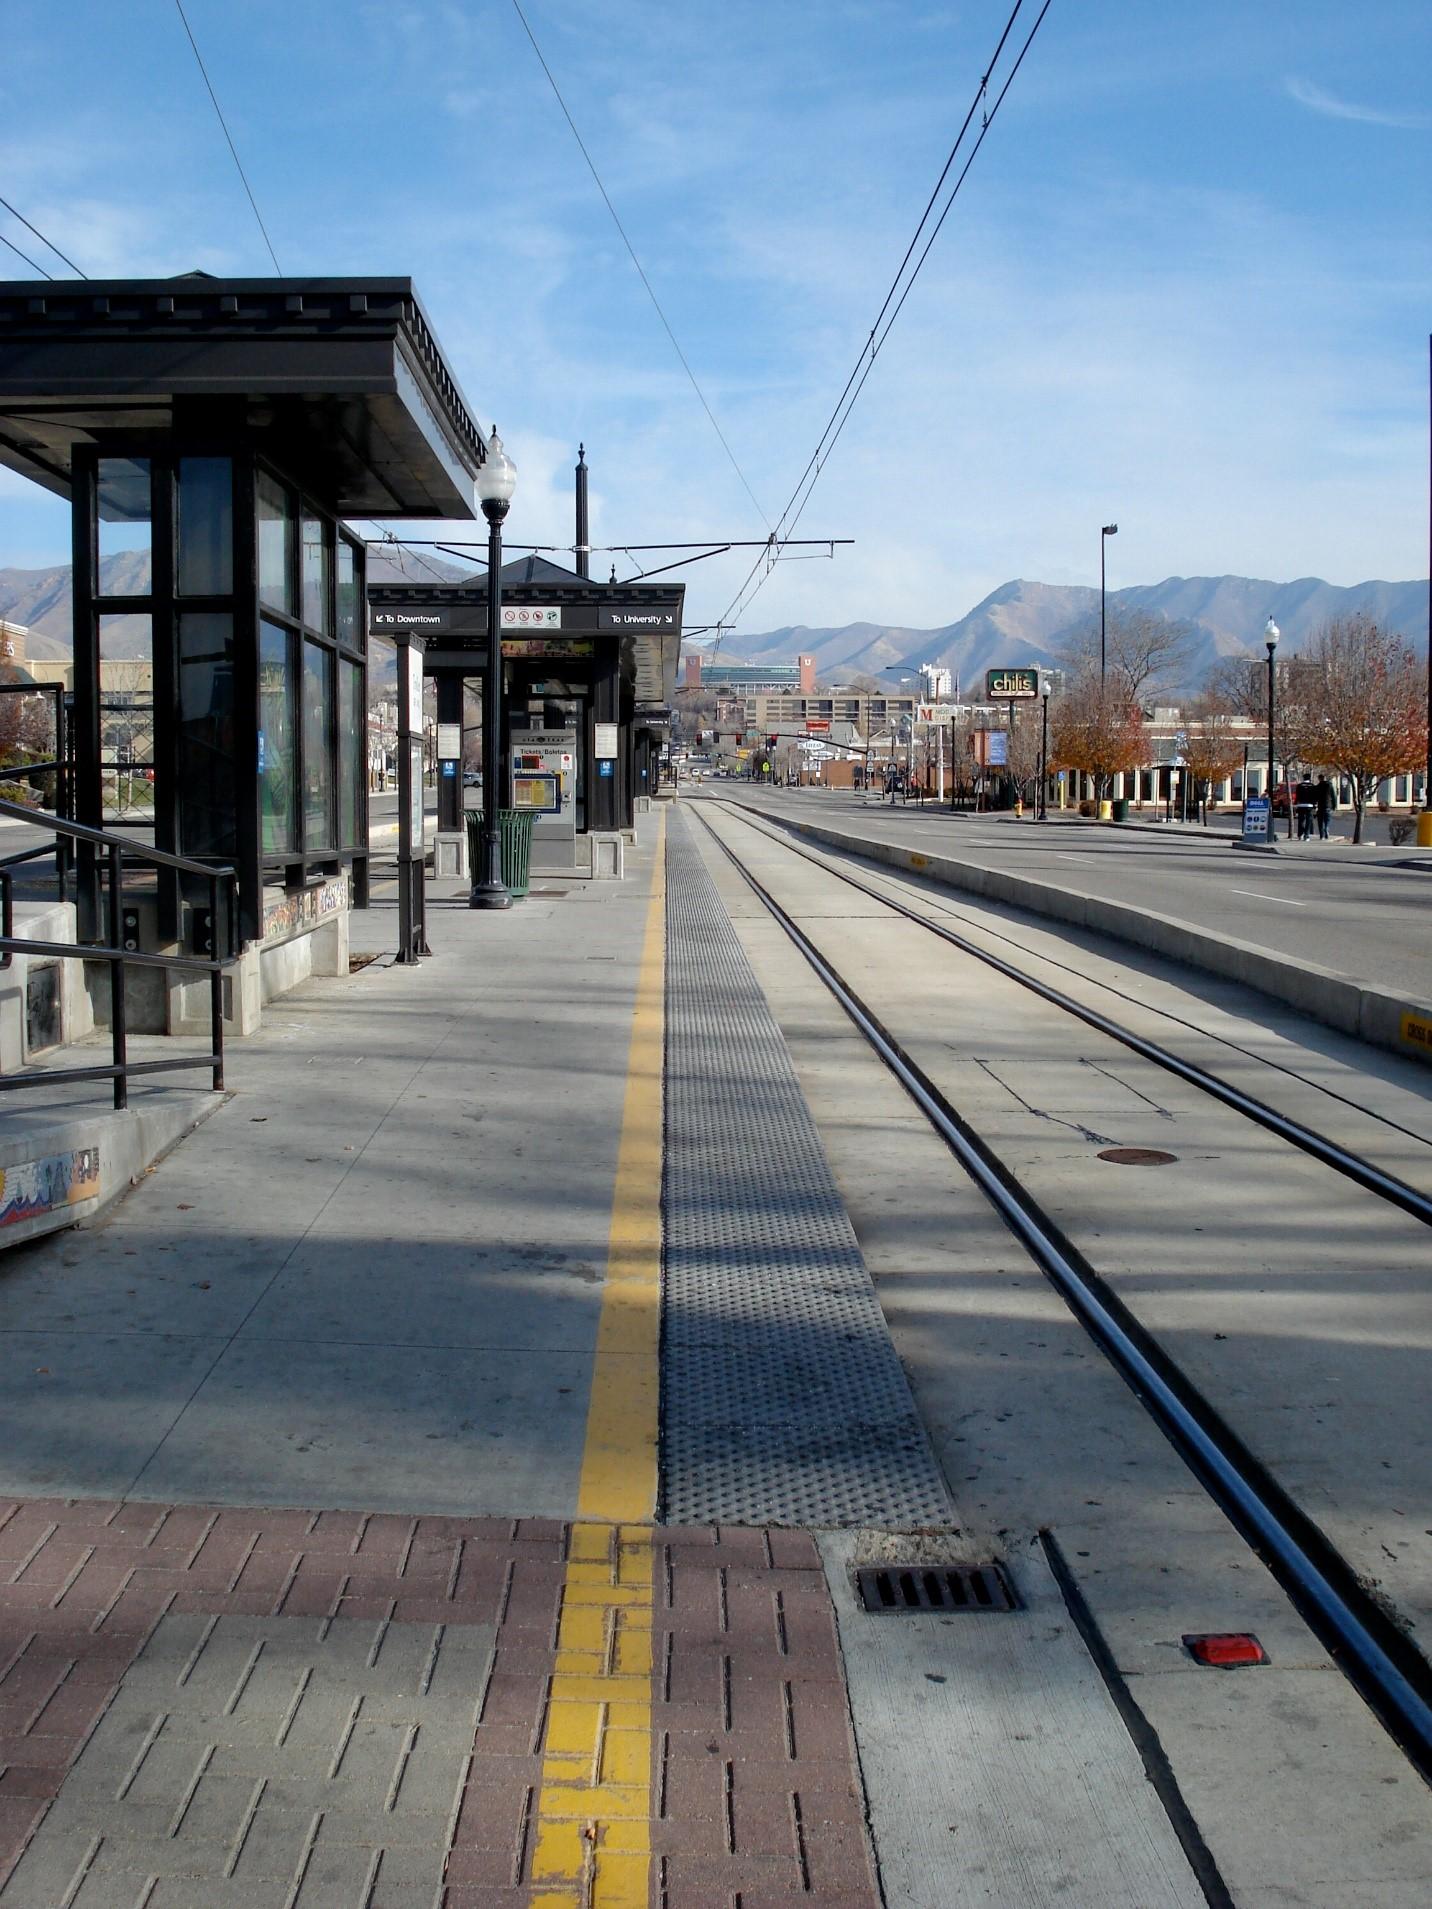 Trolley Station – Salt Lake City, UT